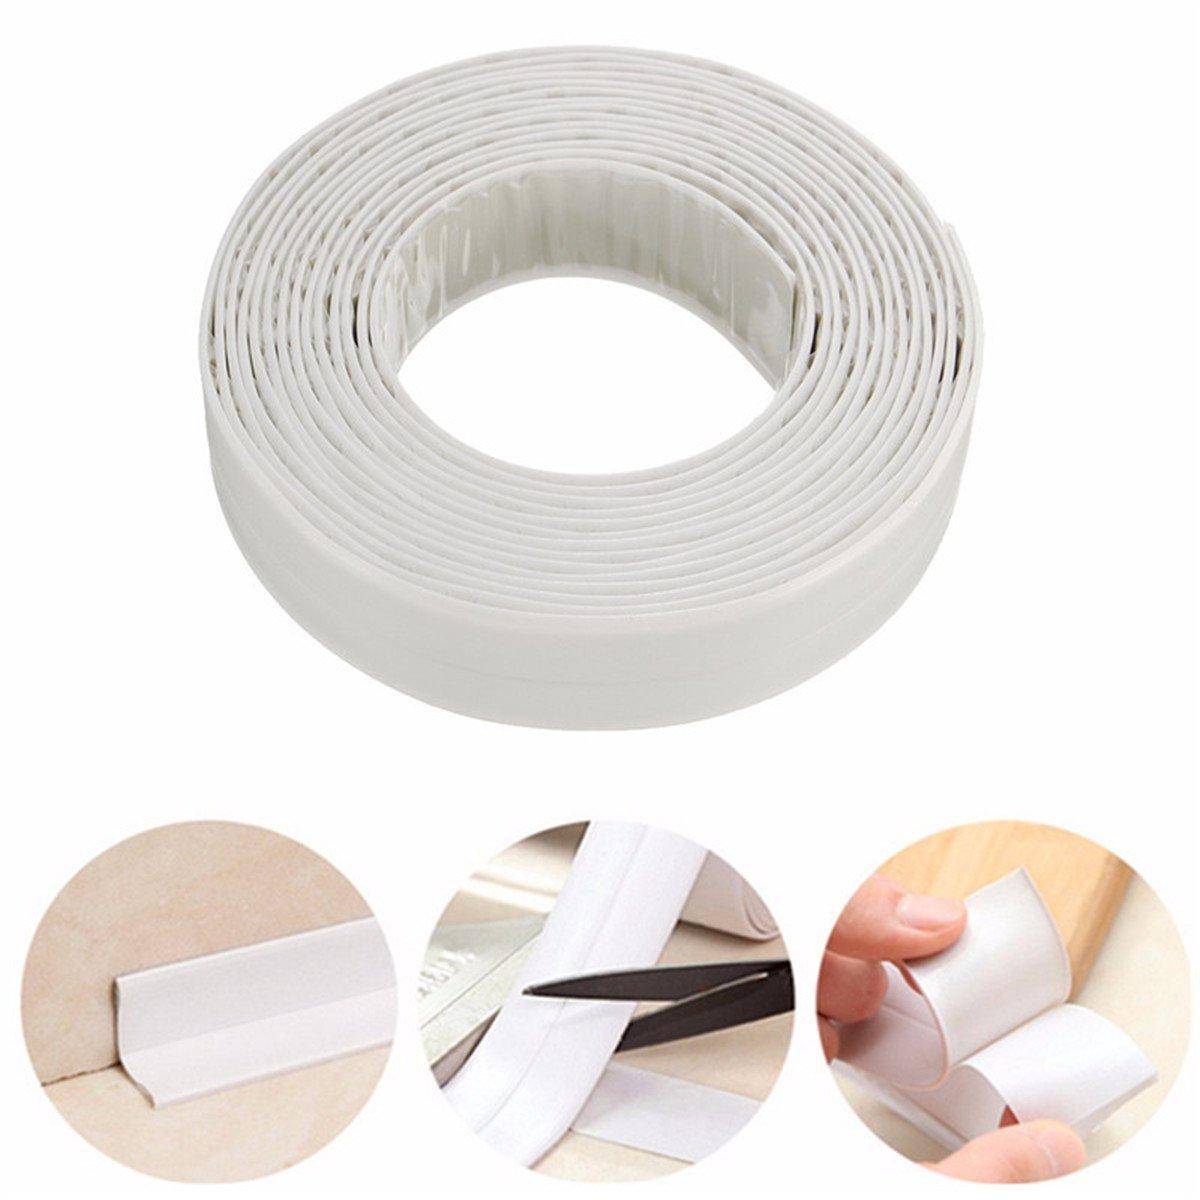 LKXHarleya PVC 22 x 3.35mm White Bathroom Bath And Wall Sealing Strip Kitchen Gap Seal Waterproof Tape